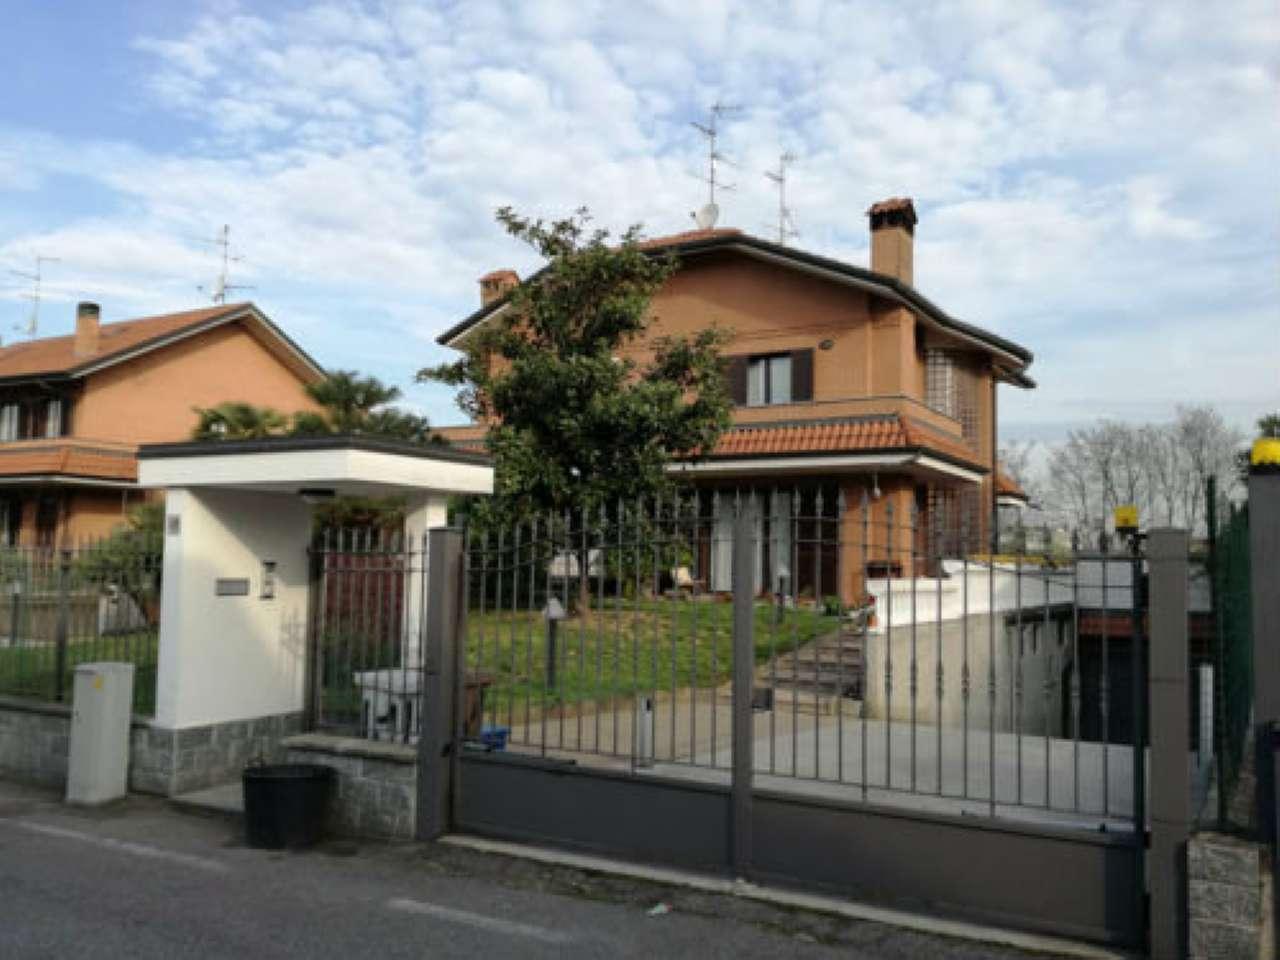 Bilocale Paderno Dugnano Via Bolzano 1